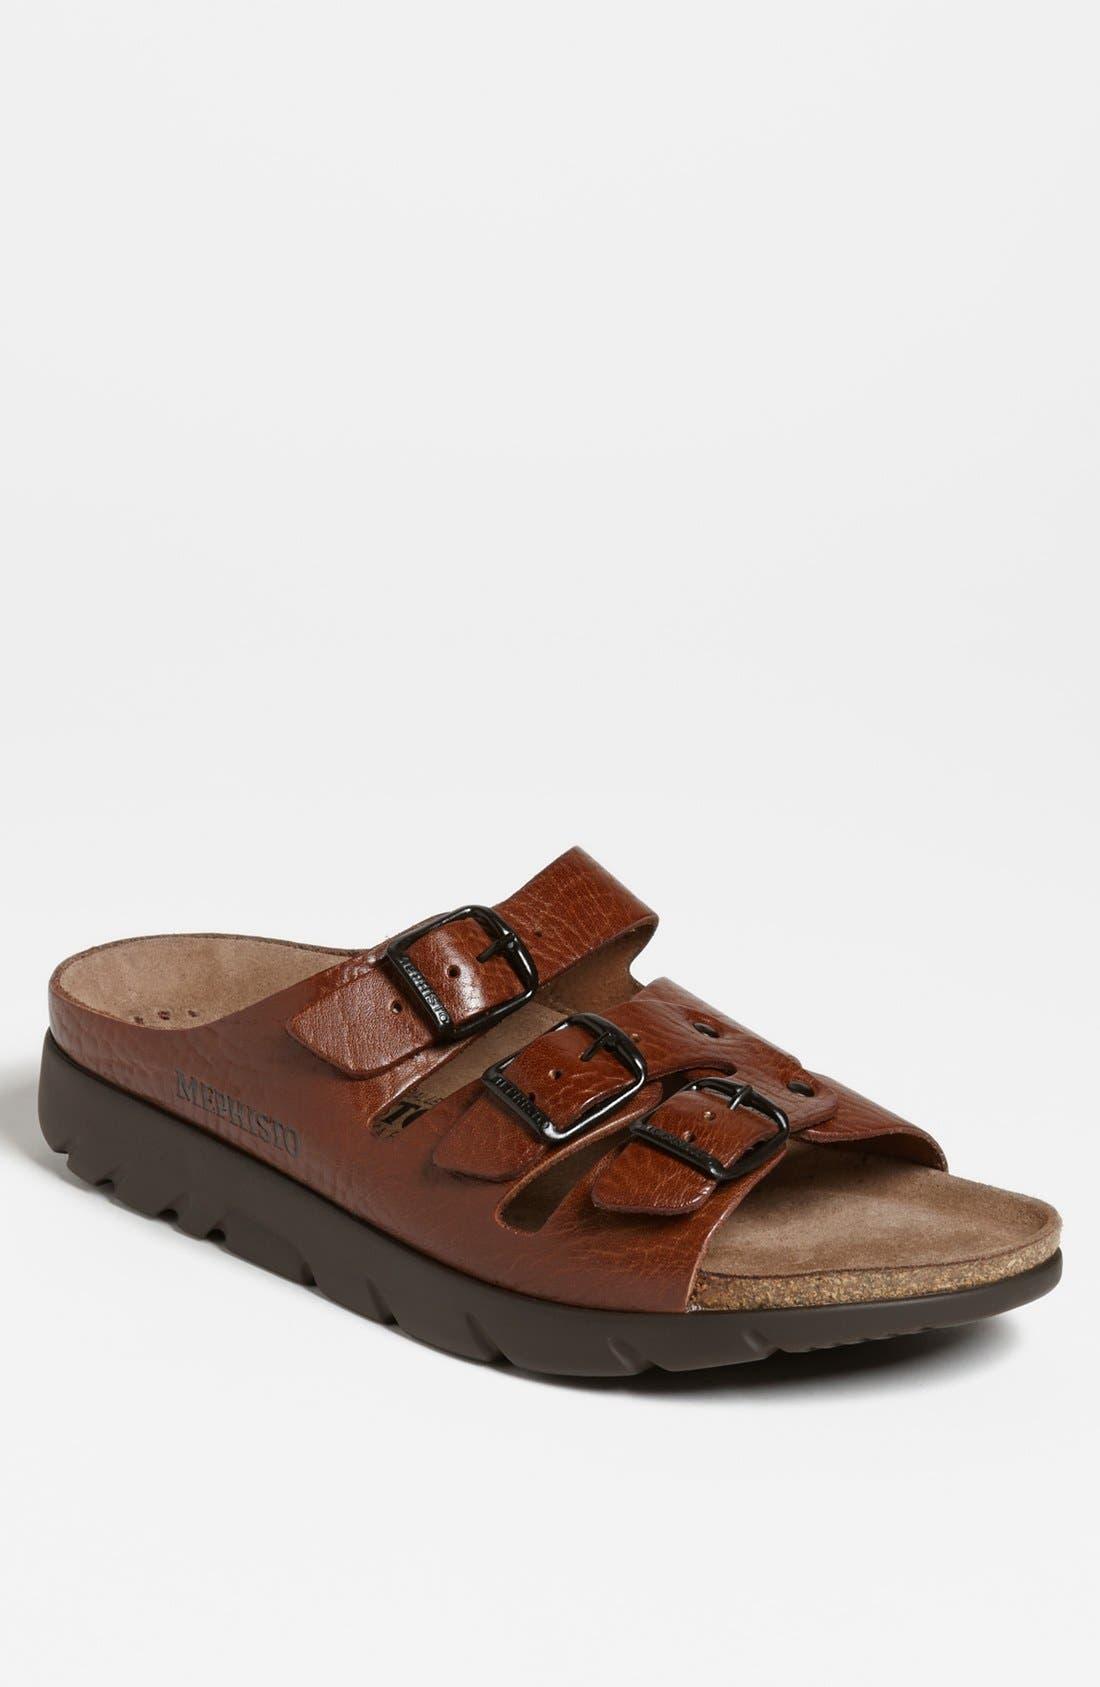 Mephisto 'Zach 3' Sandal